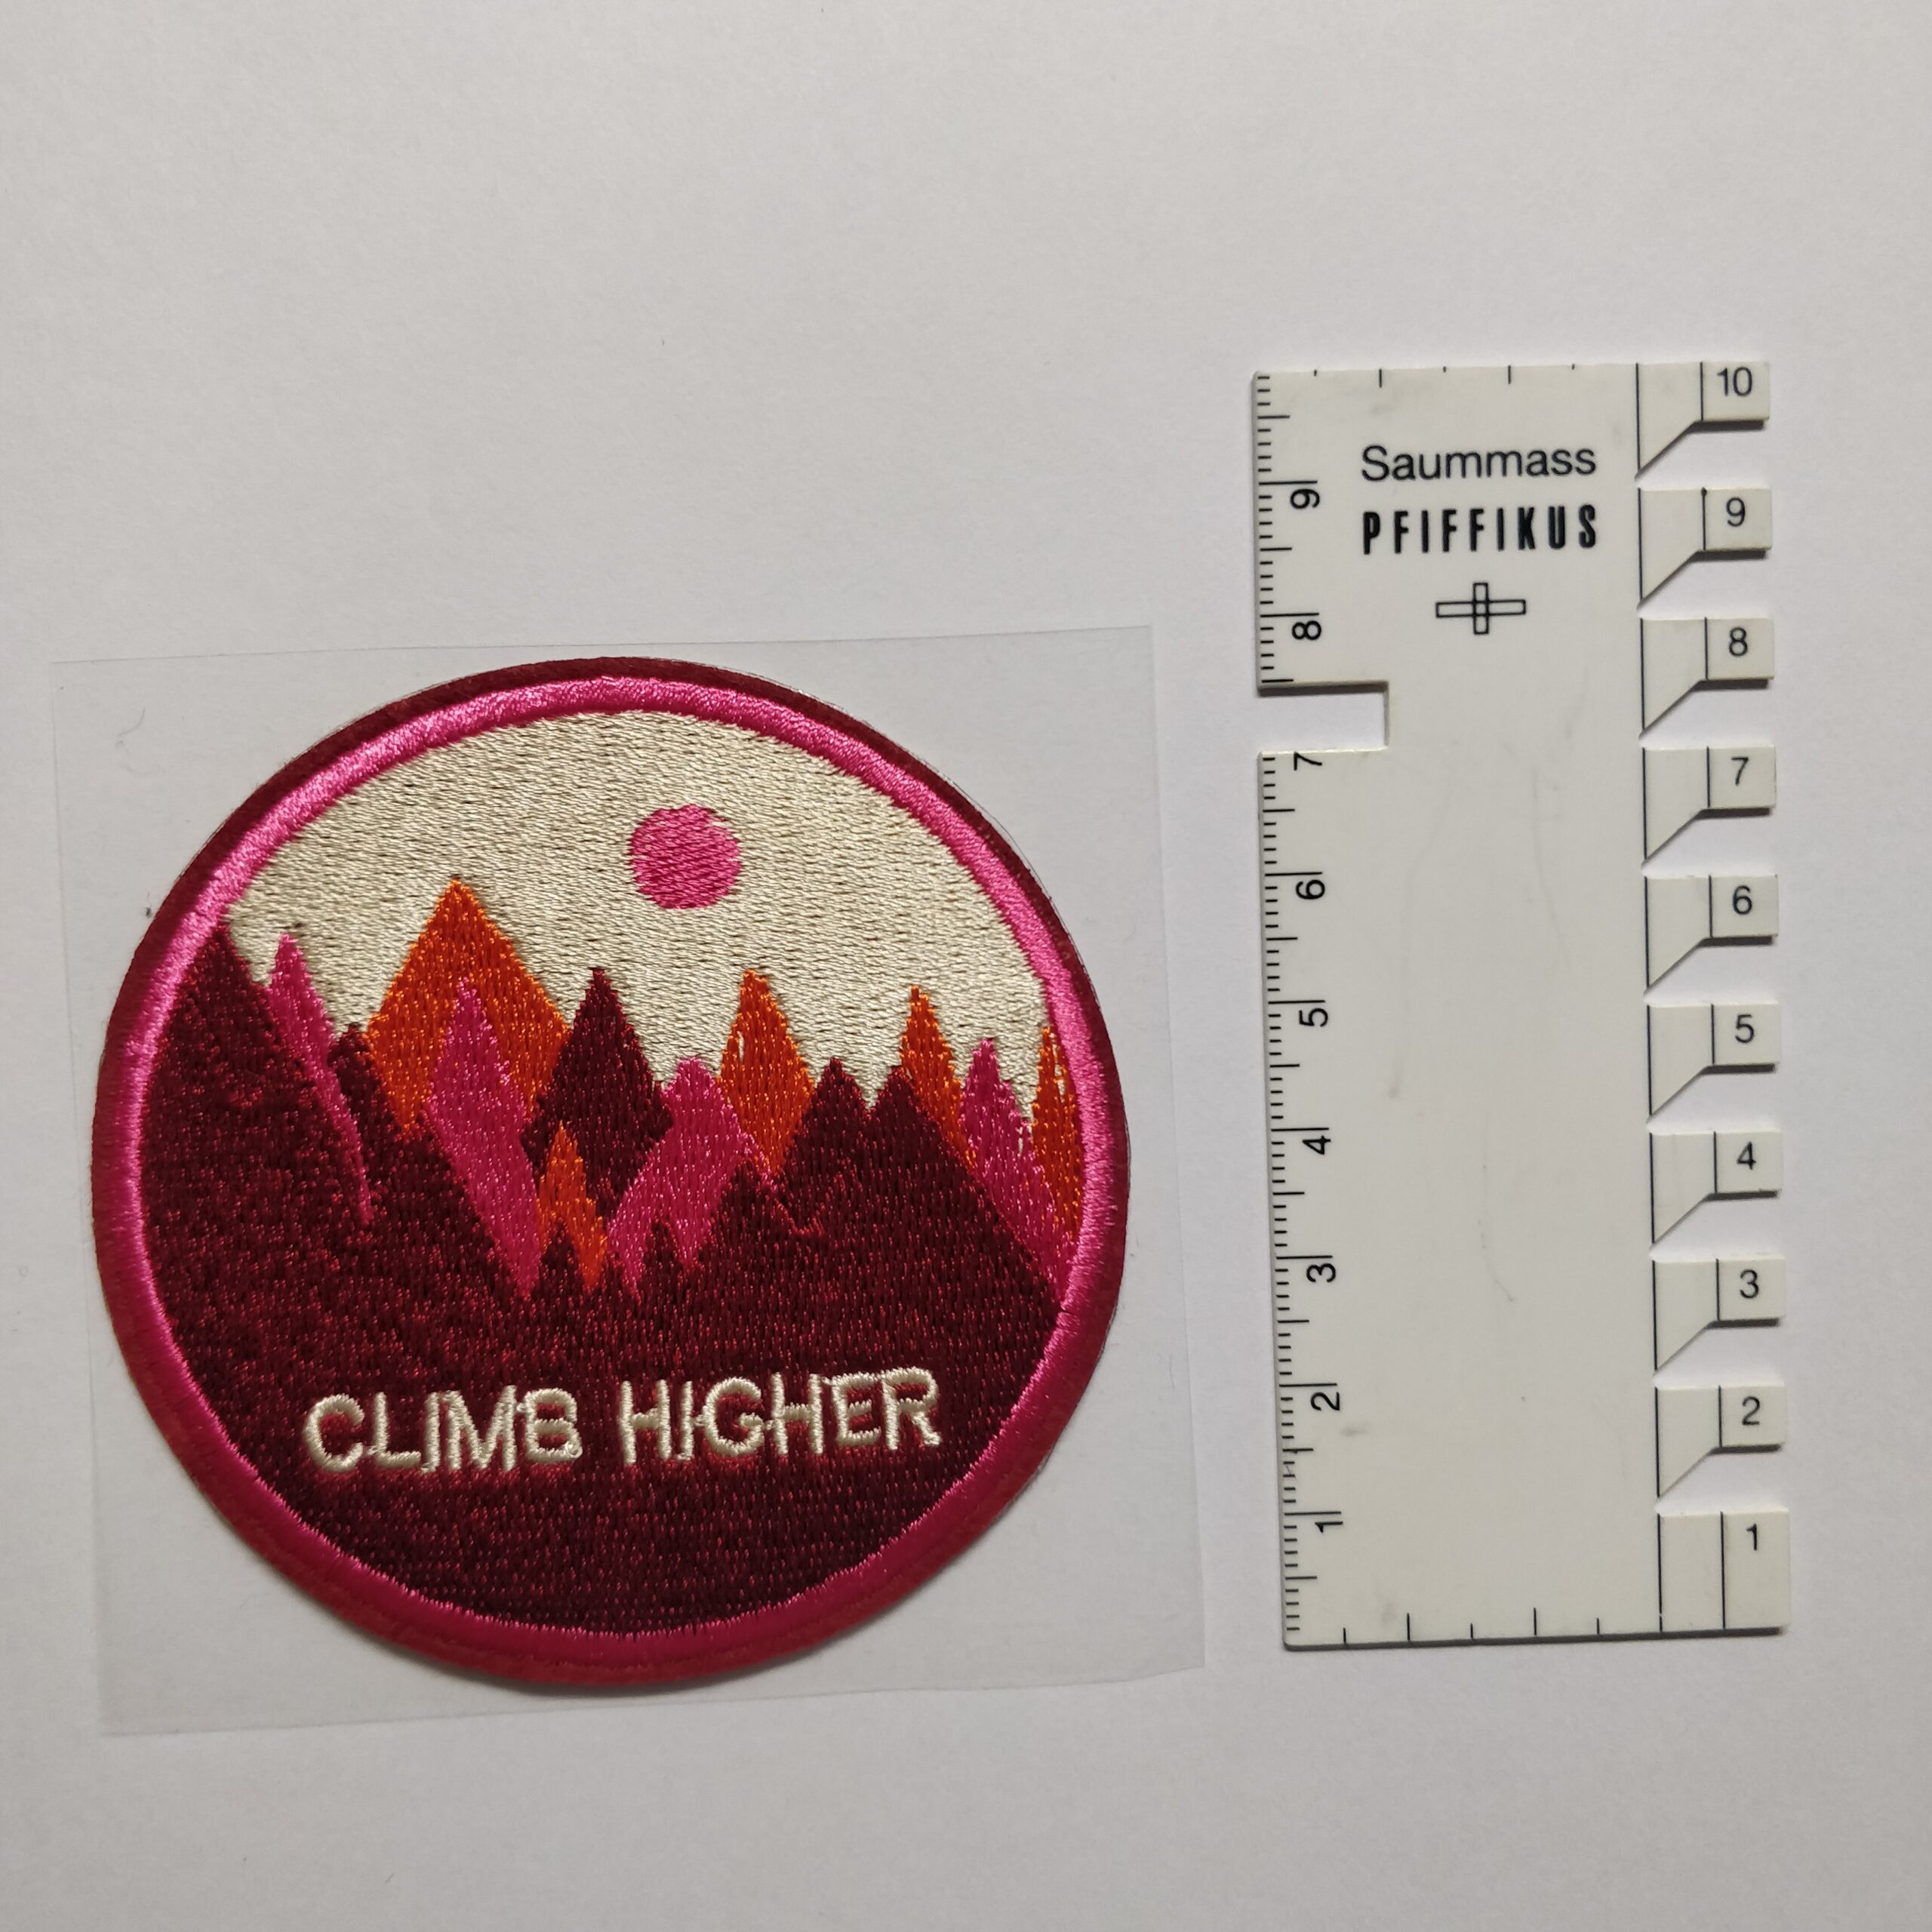 clim higher patch